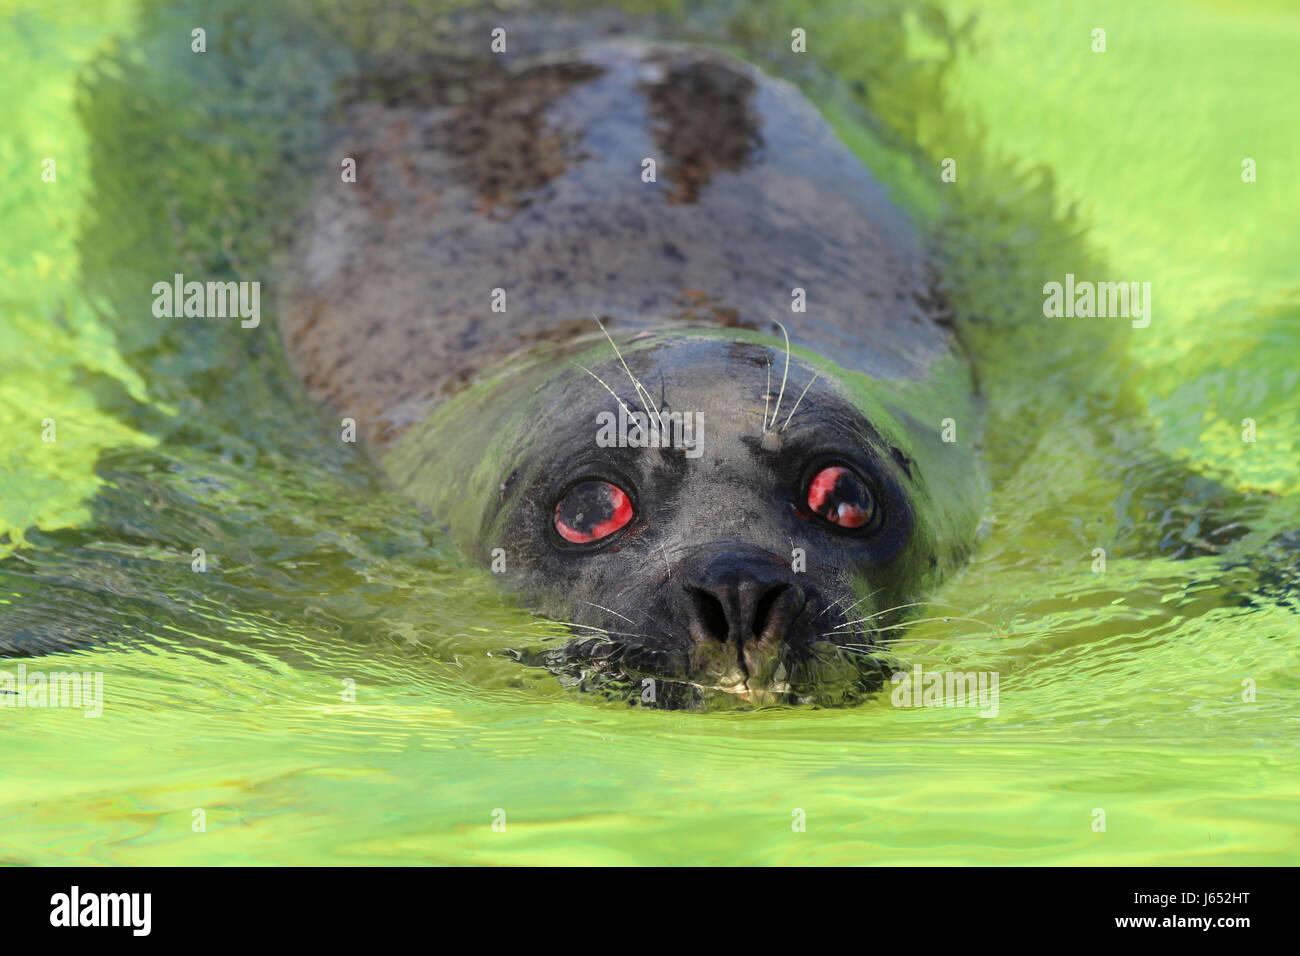 Phoque commun Phoca vitulina avec blessure à l'Œil Photo Stock